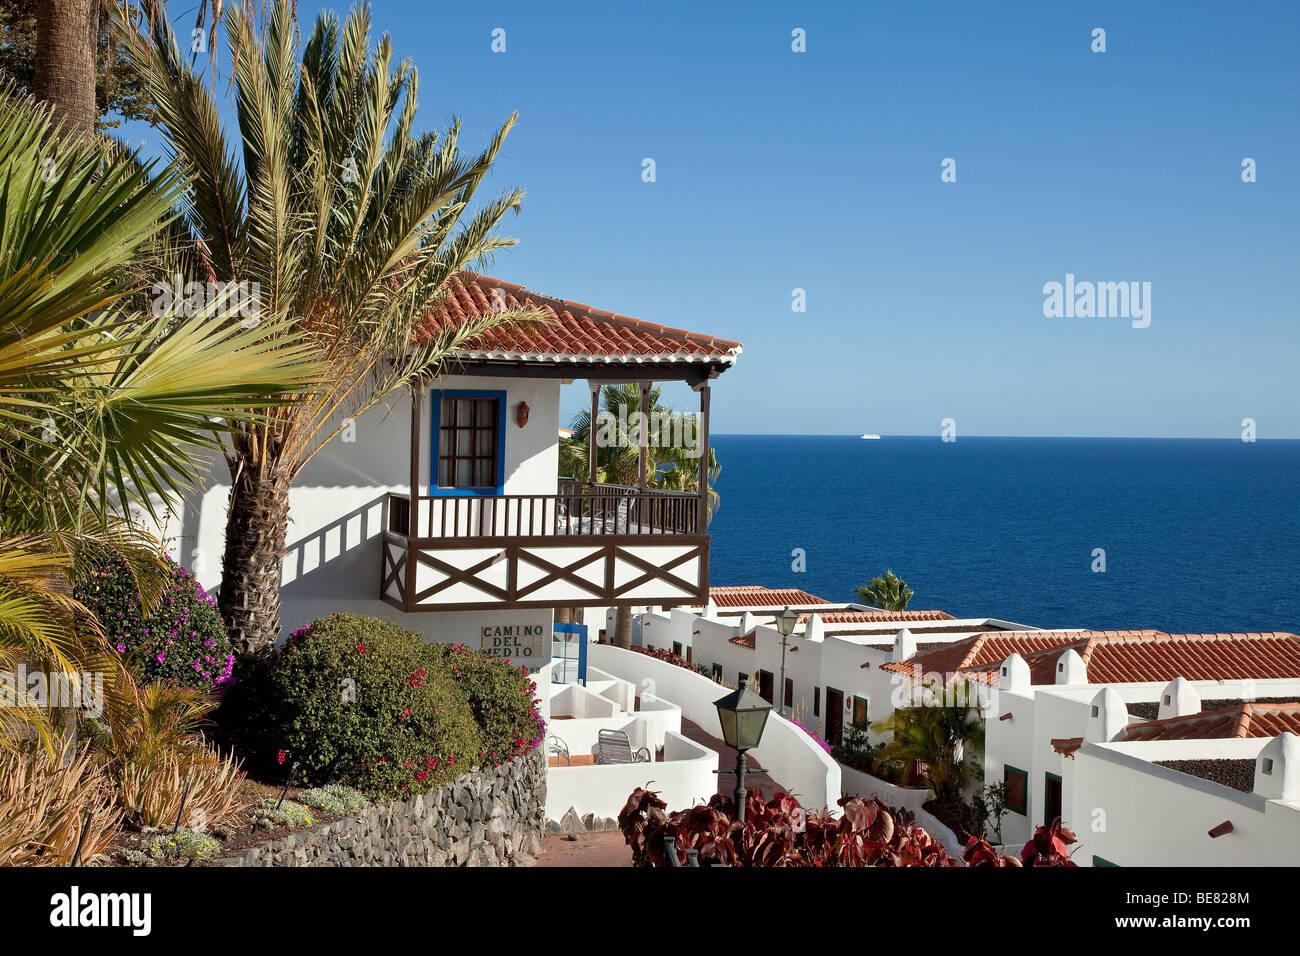 The Jardin Tecina Hotel with sea view in the sunlight, Playa de Santiago, La Gomera, Canary Islands, Spain, Europe - Stock Image